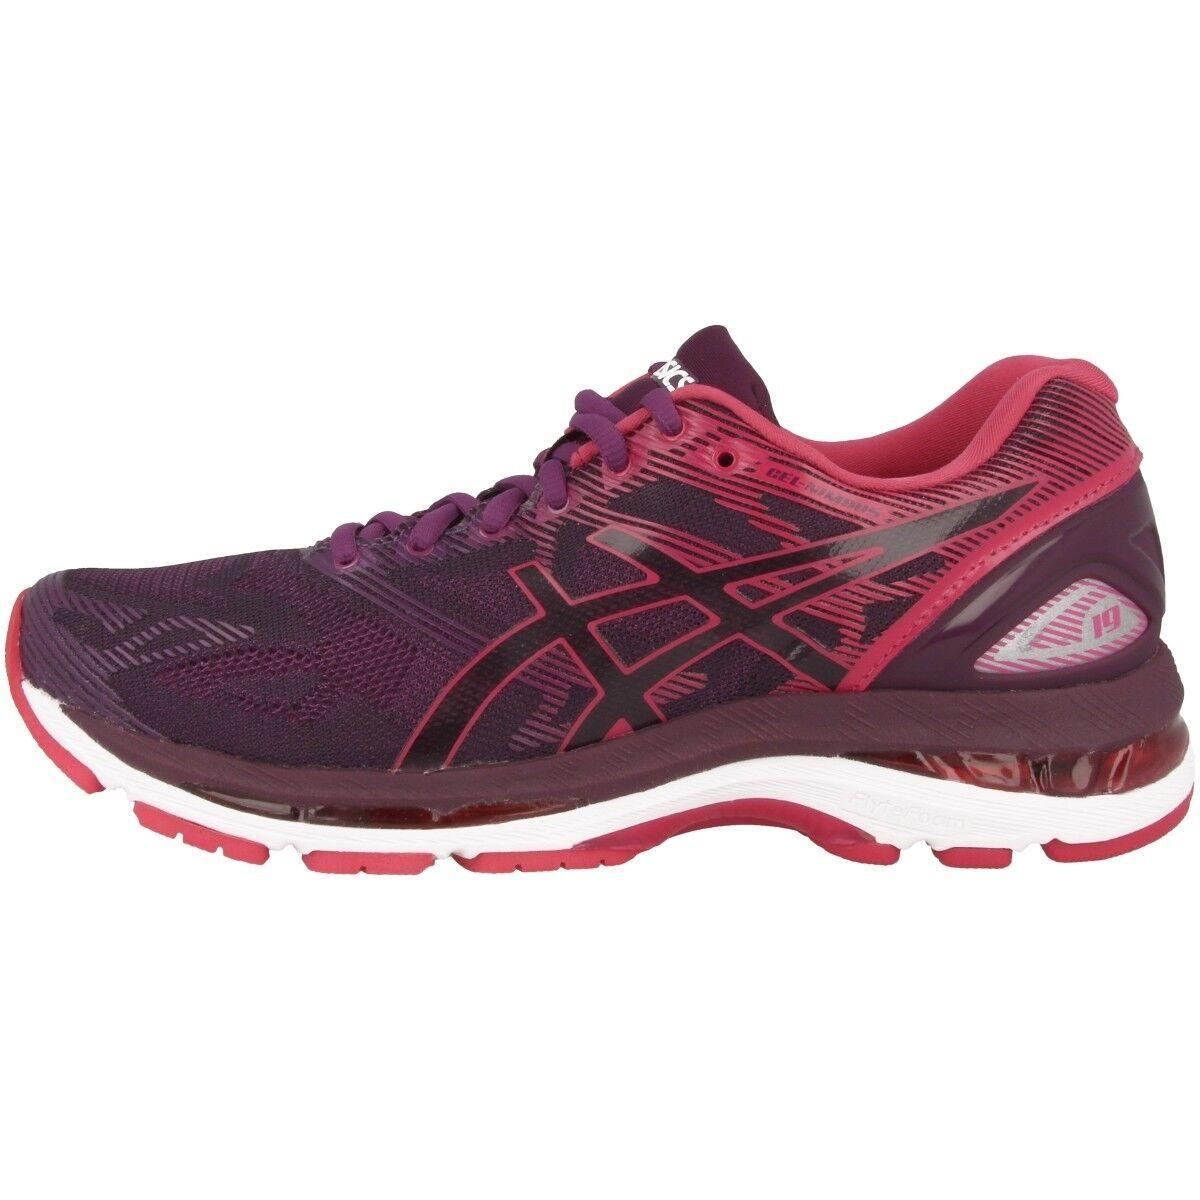 Asics Gel-Nimbus 19 Damens Damen Laufschuhe schwarz schwarz schwarz pink bloom Running T750N-9020 b8e10e